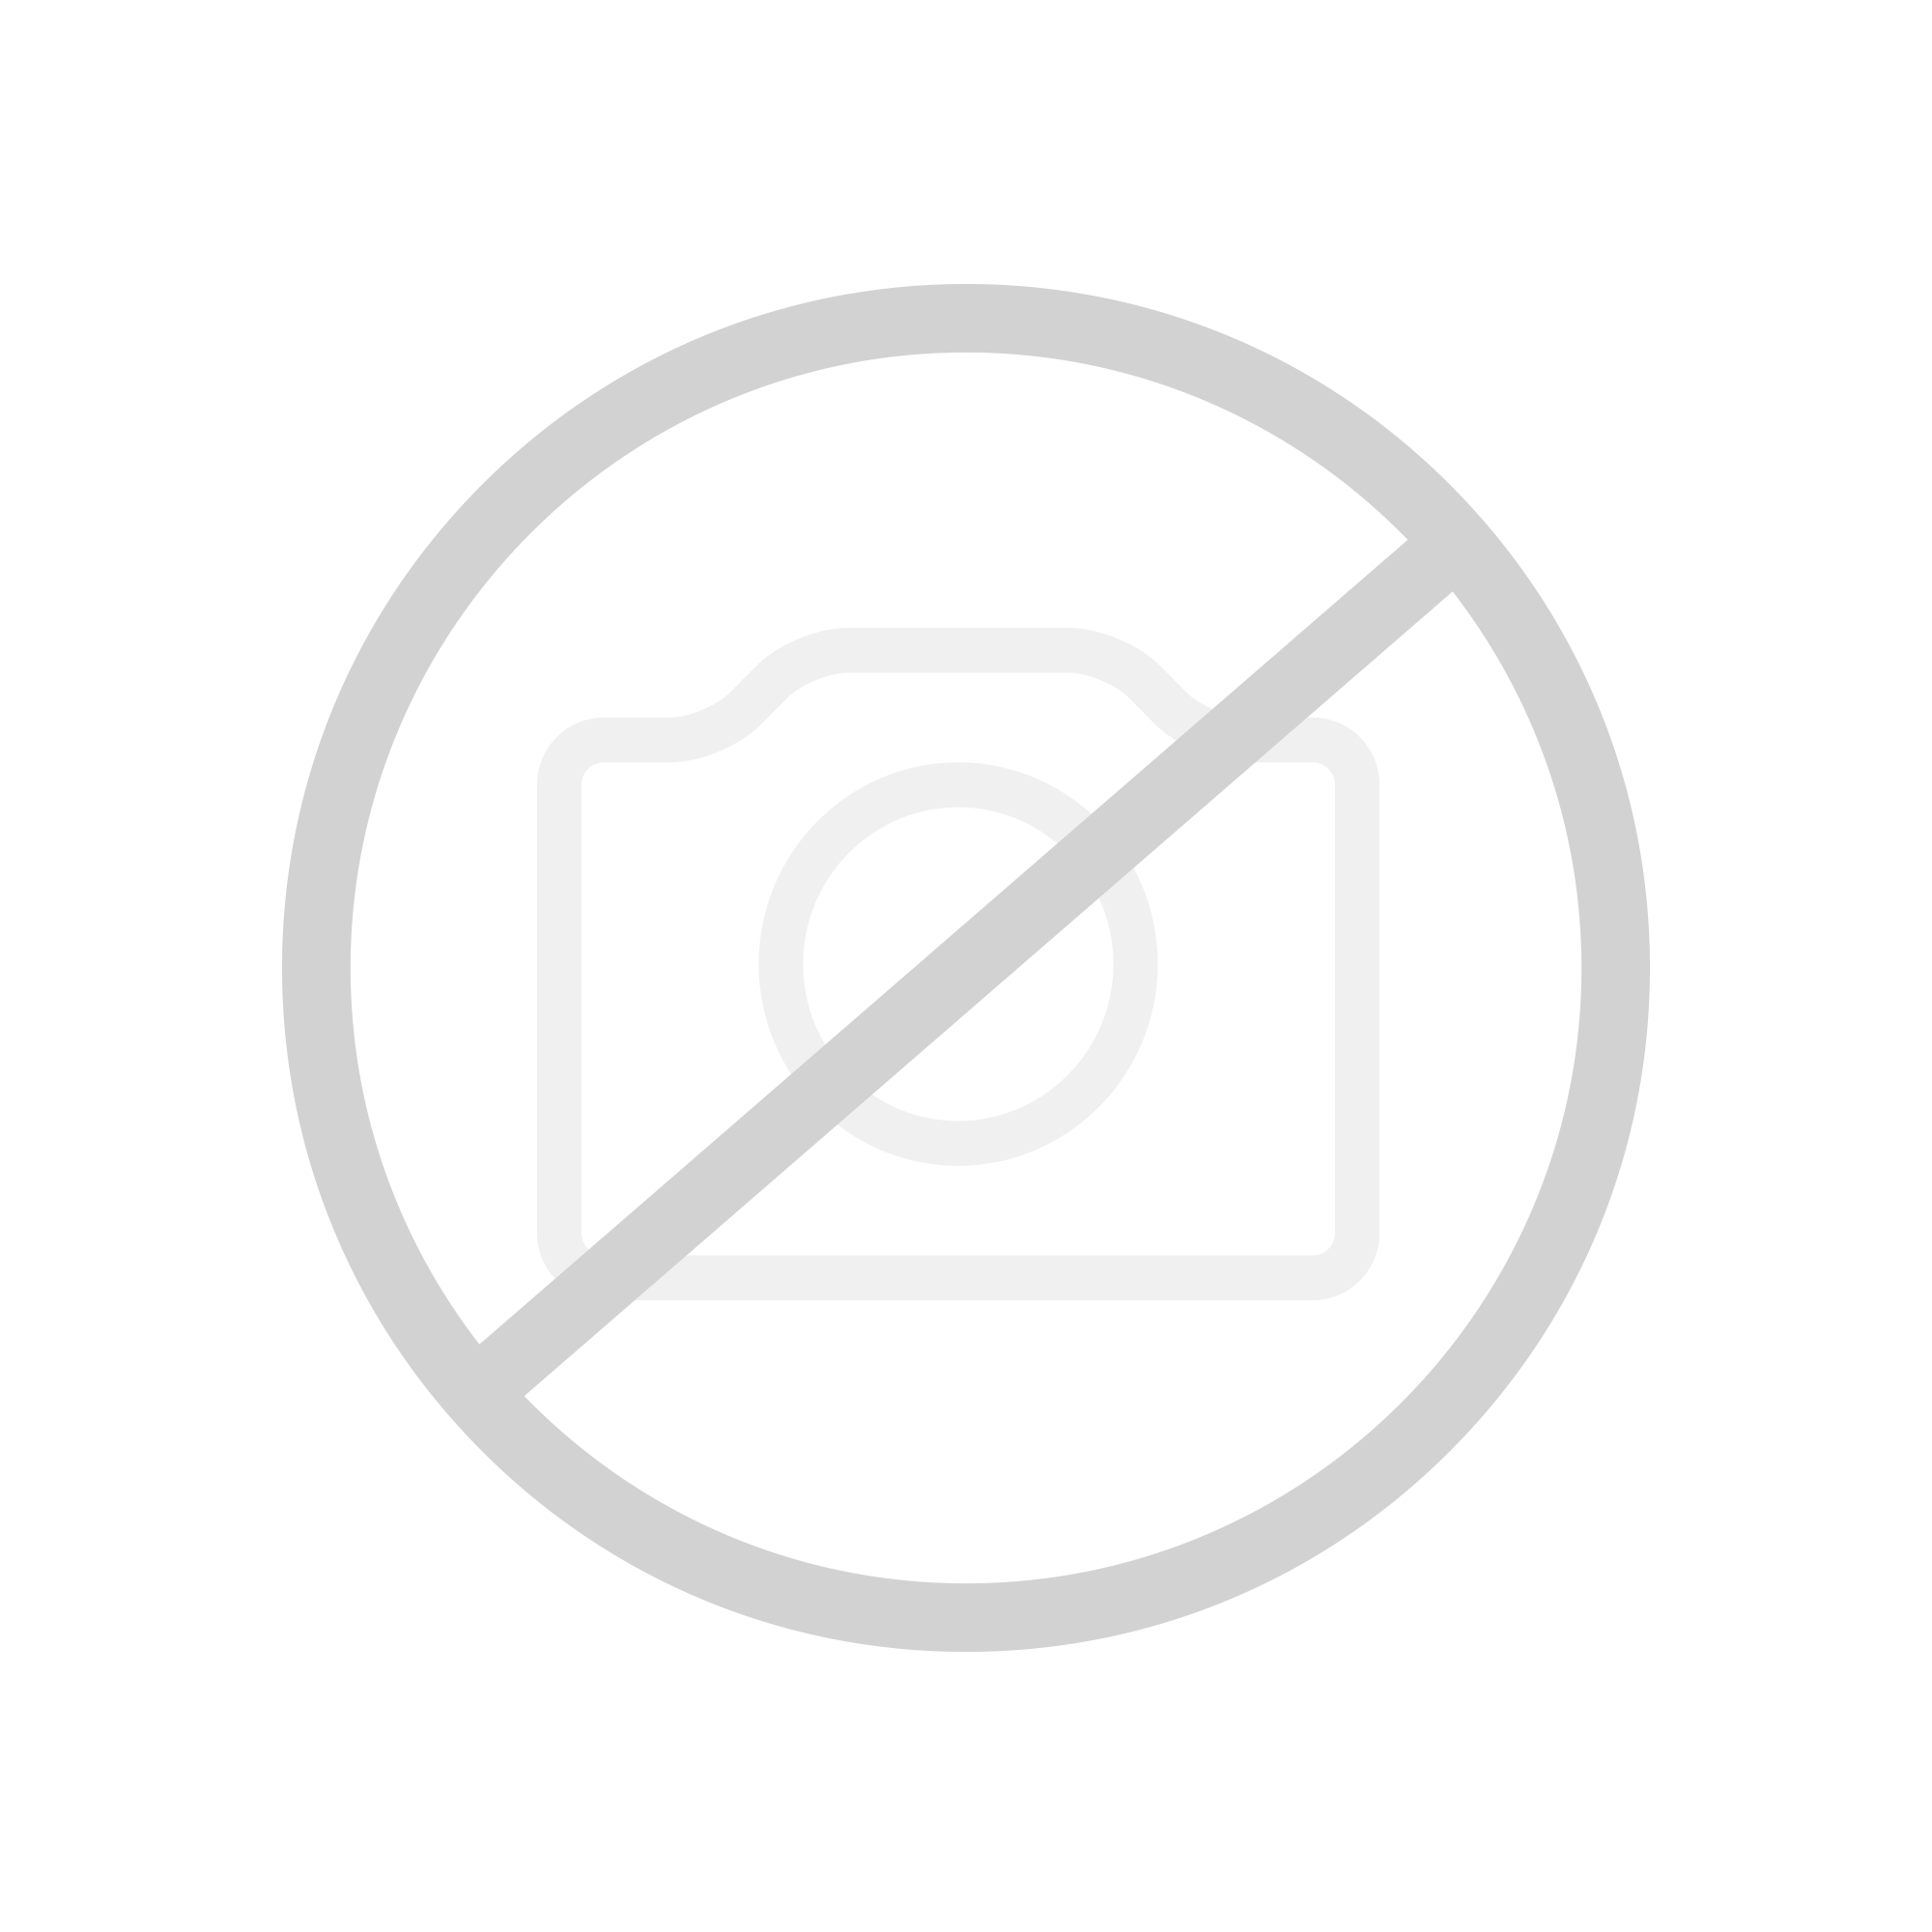 Wagner-Ewar Flüssigseife Ewaderm-Soft VE 12 Flaschen à 500ml/Karton